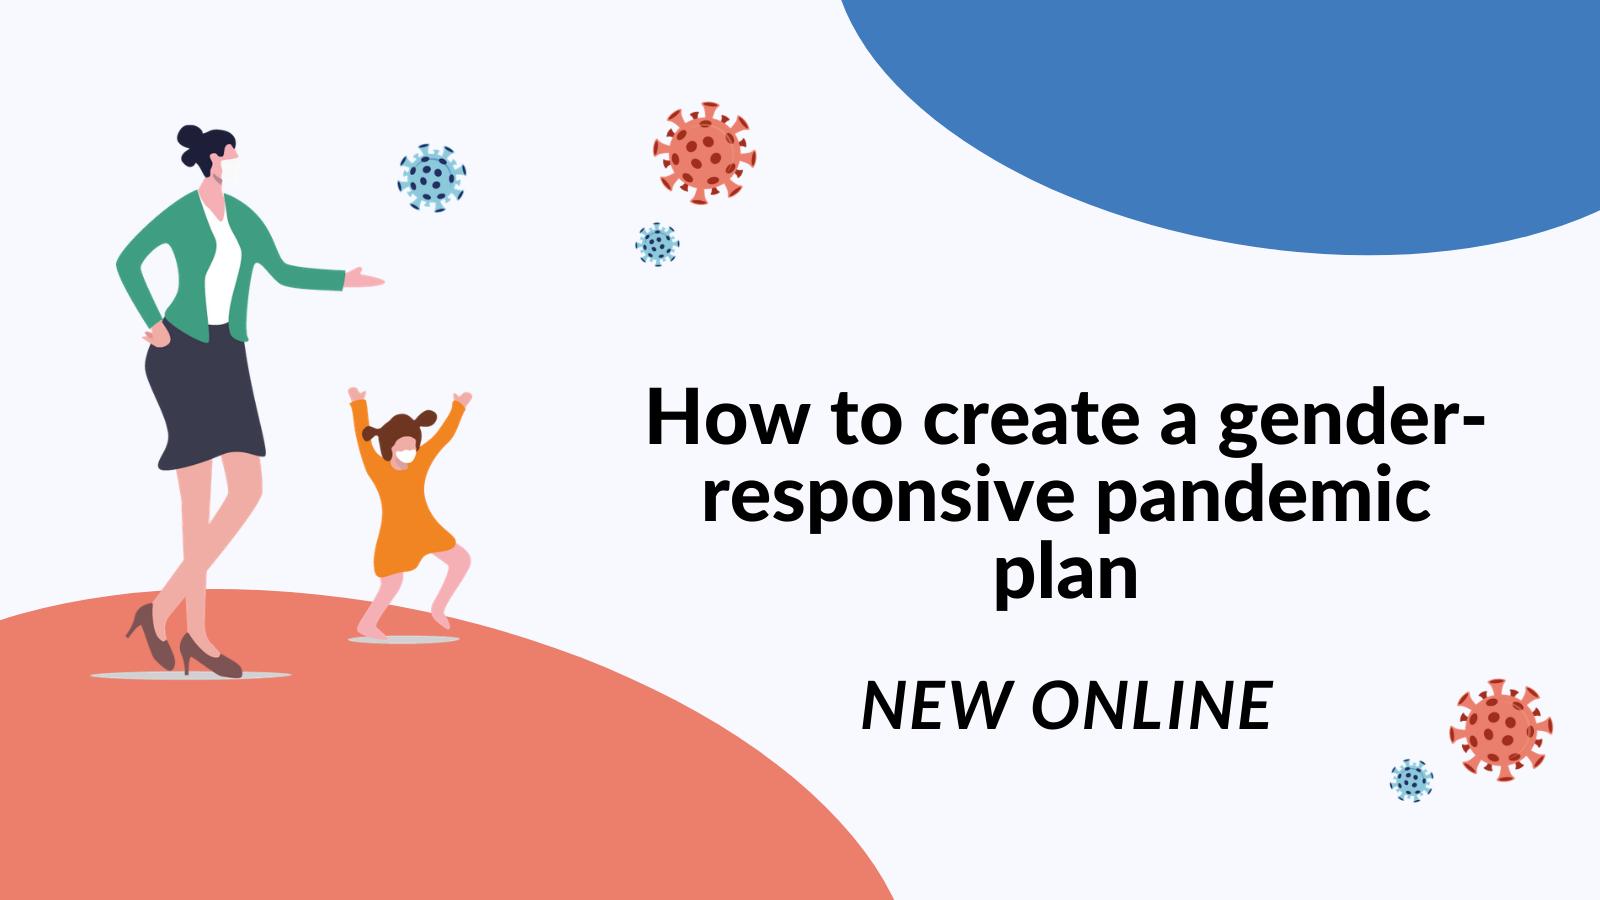 Gender-responsive pandemic plan